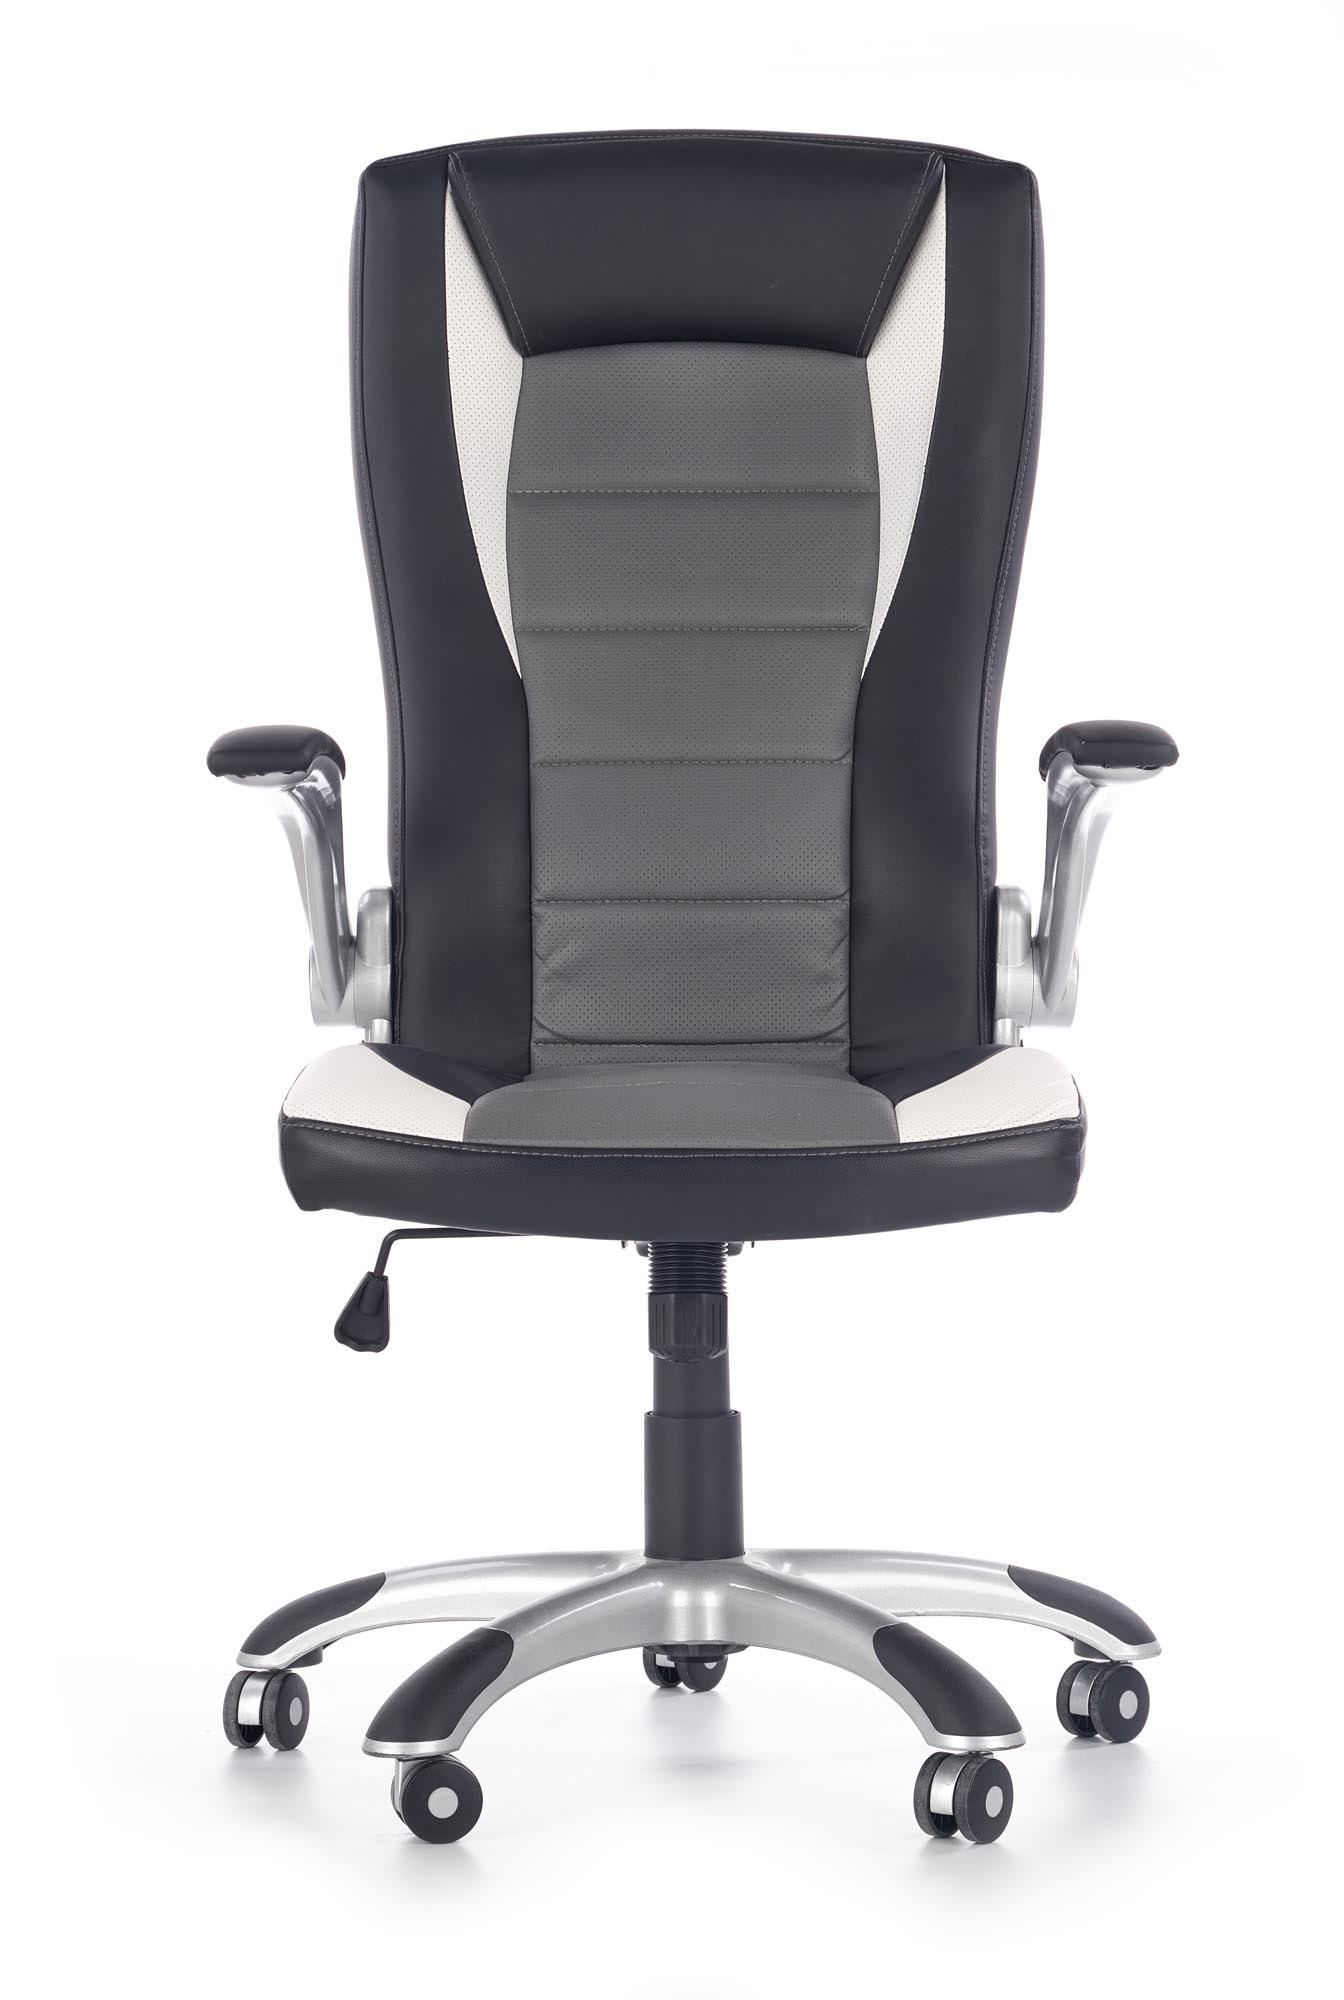 Scaun de birou ergonomic tapitat cu piele ecologica Upset Black / Grey / White, l66xA70xH115-125 cm imagine